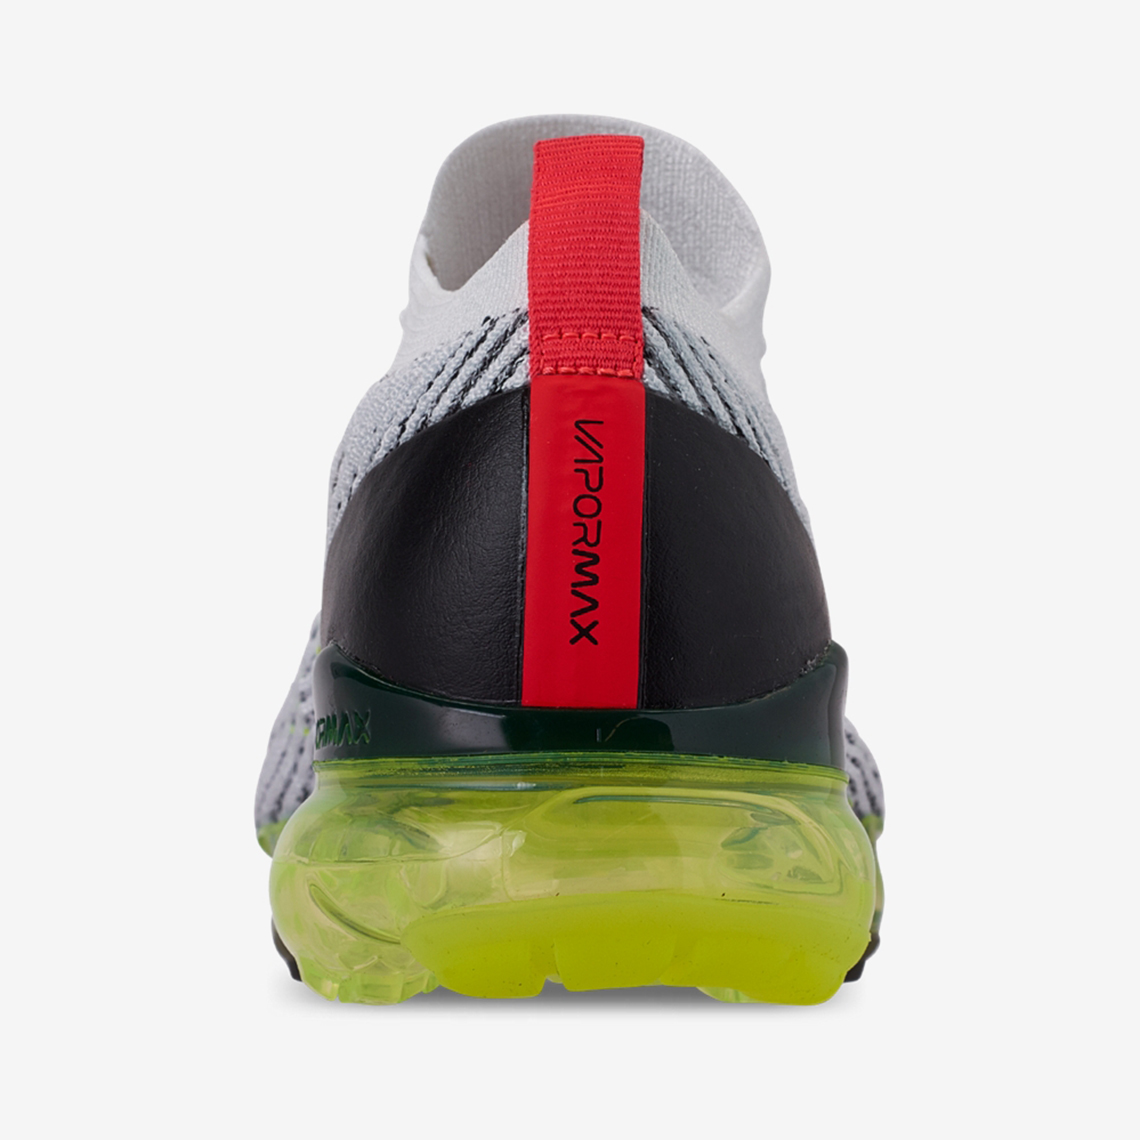 99c6973f8a Nike Vapormax Flyknit 3 White Volt Crimson AJ6900-100 | SneakerNews.com